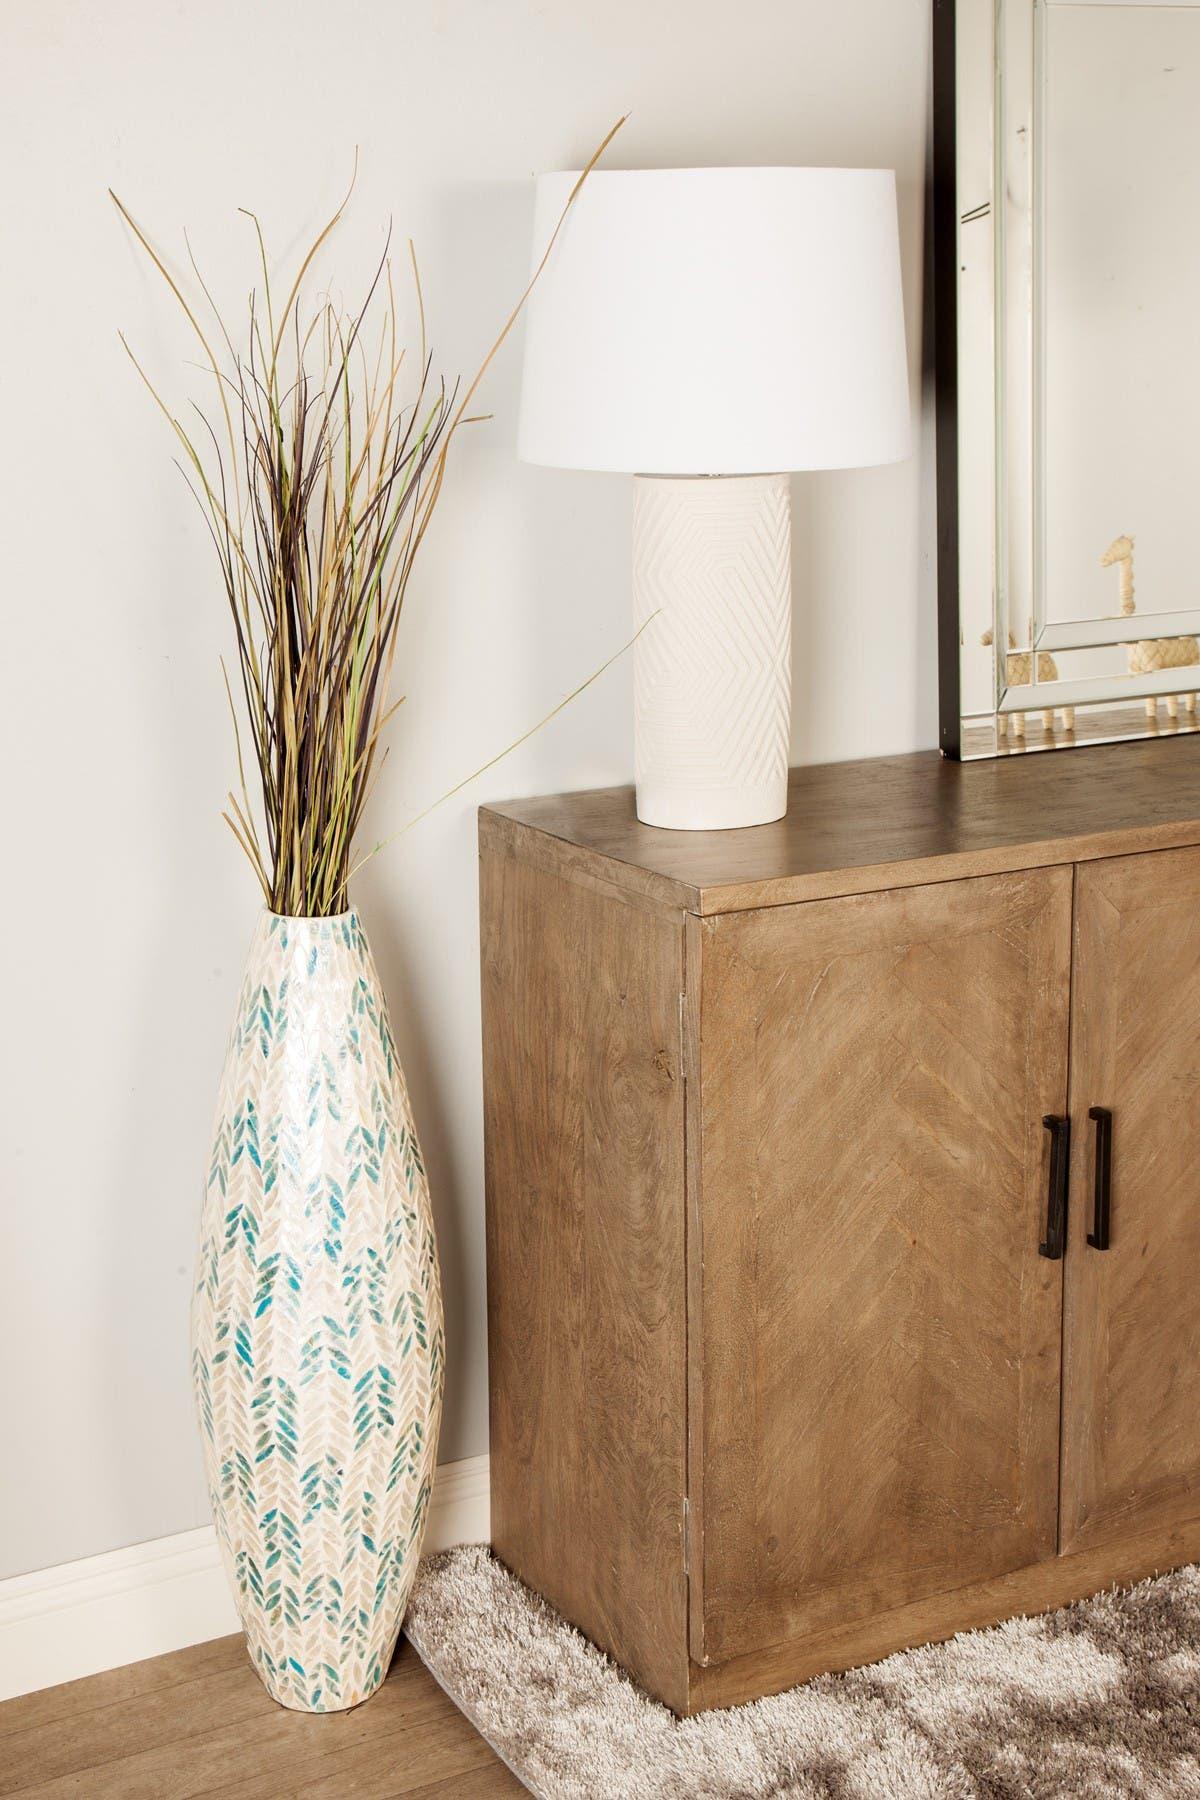 "Image of Willow Row Multi Colored Bamboo Coastal Vase - 34"" x 11"" x 11"""